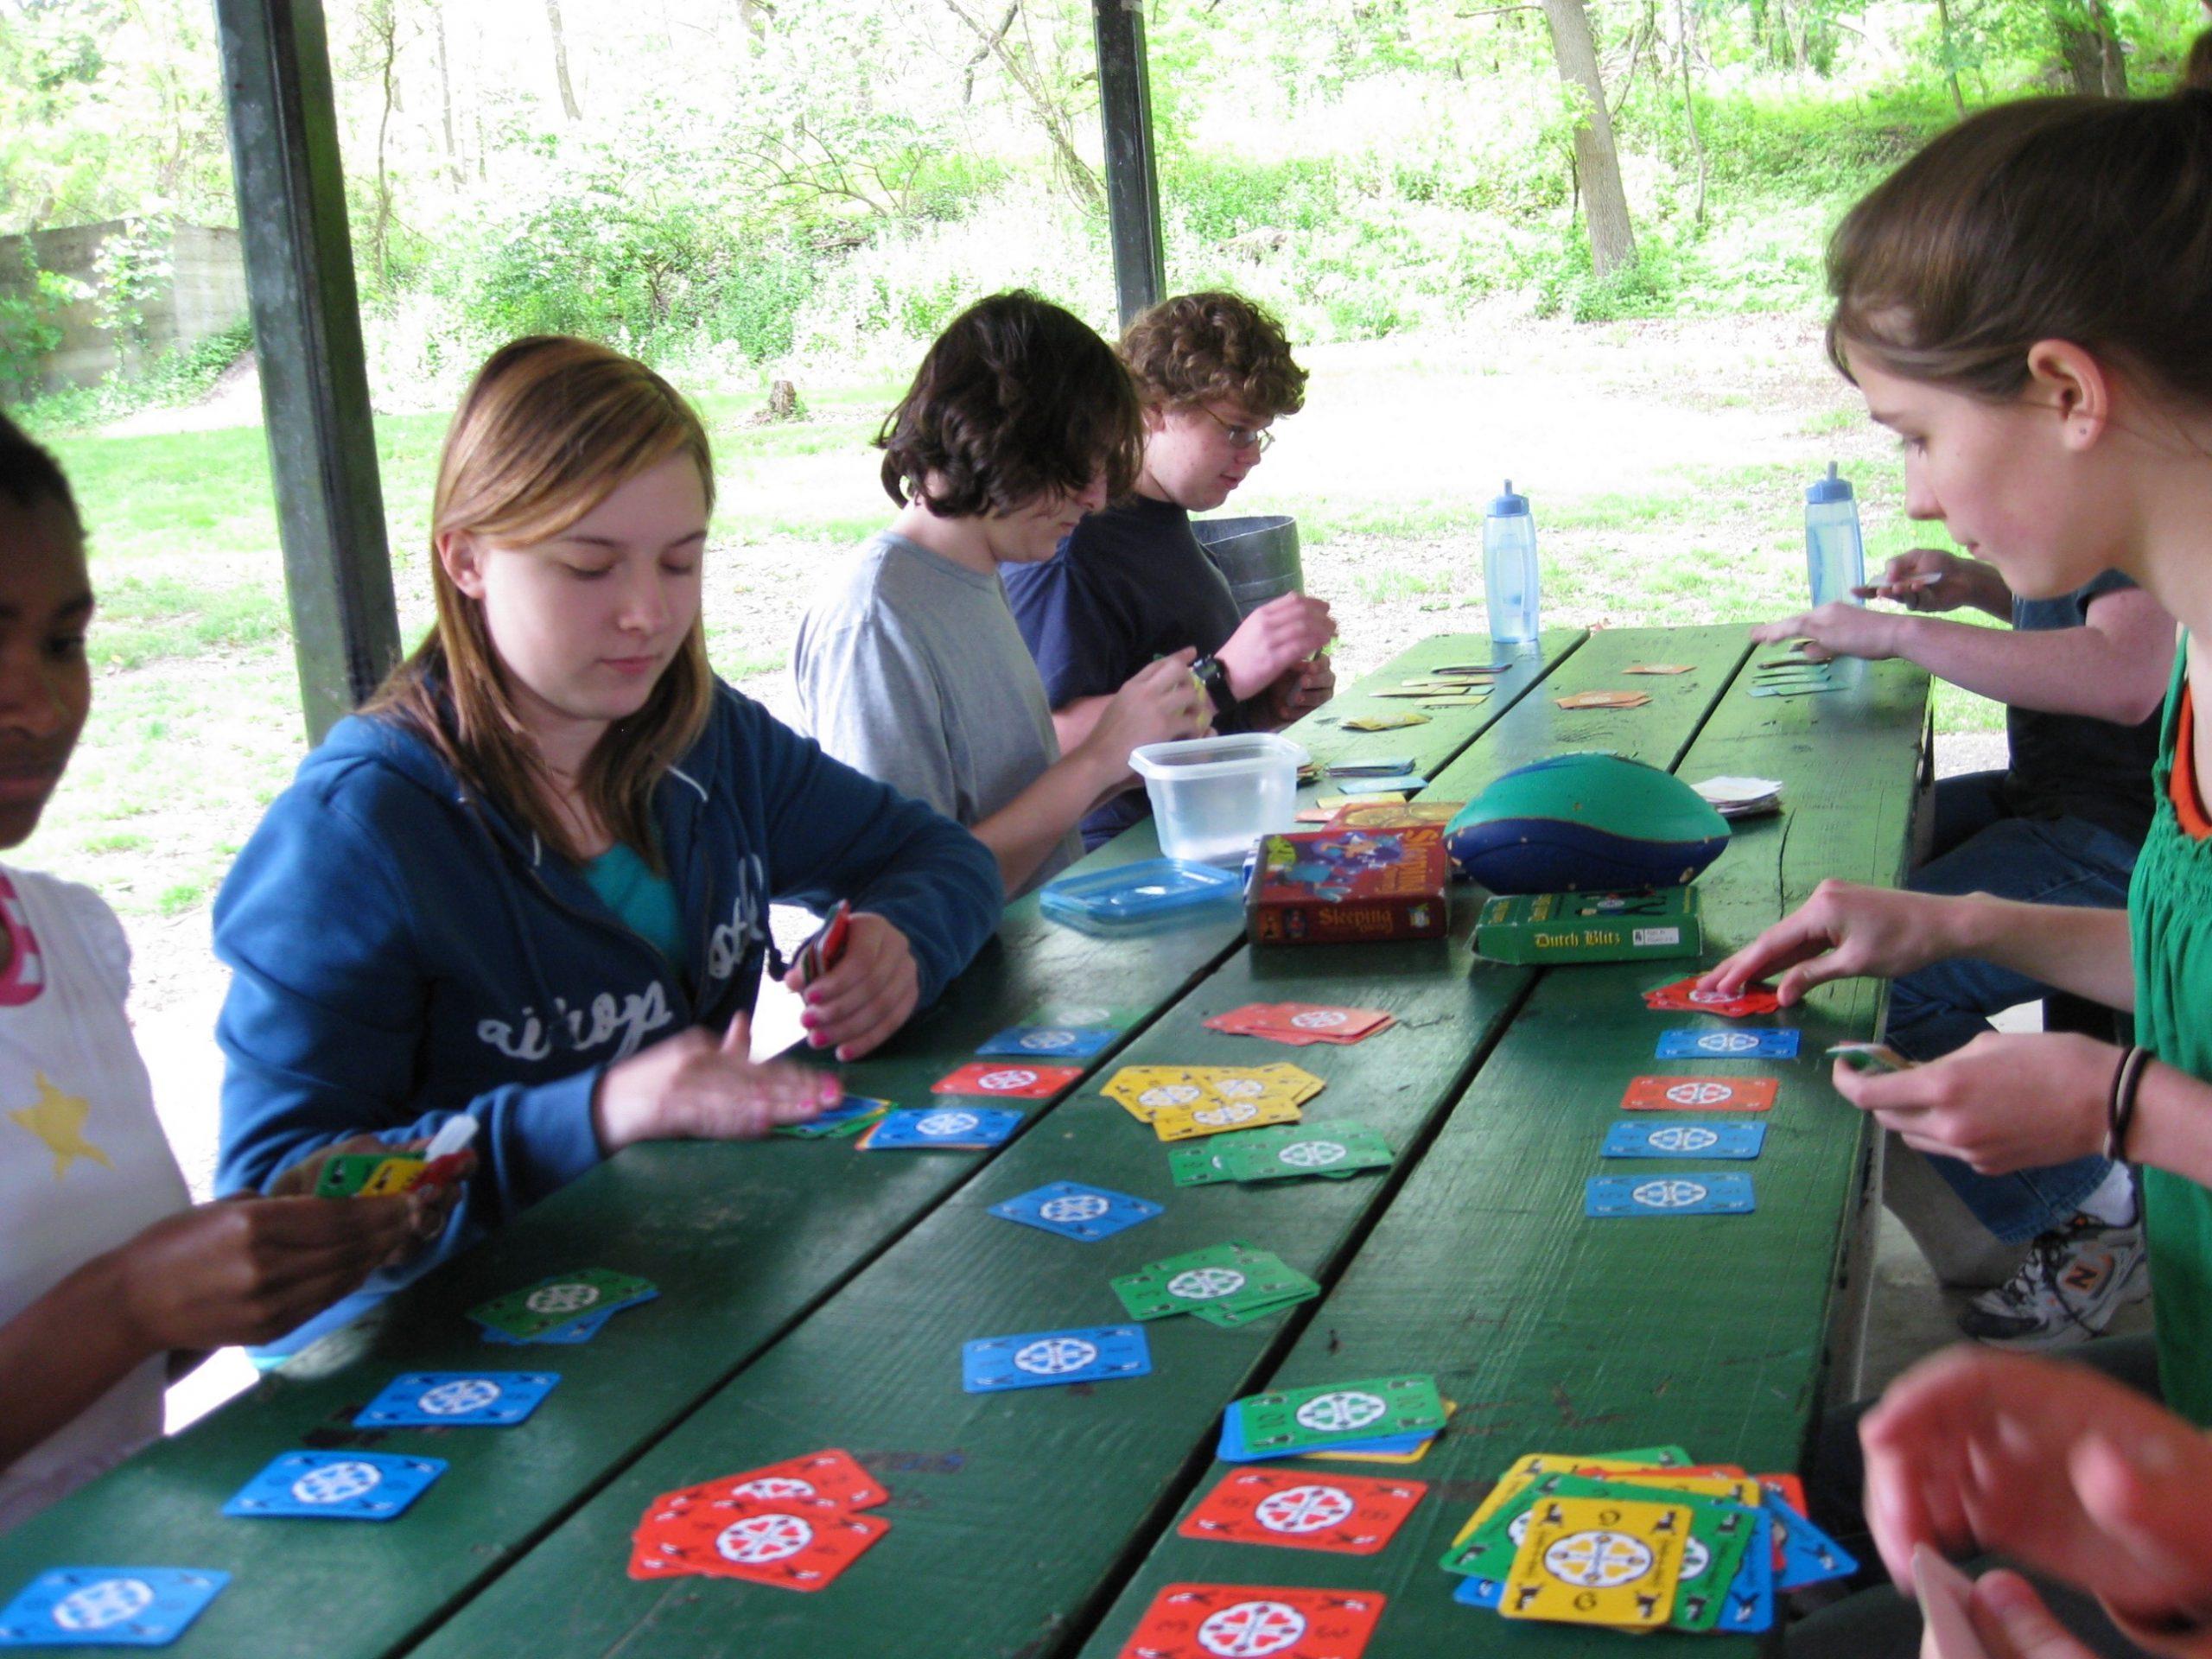 homeschool podding up groups